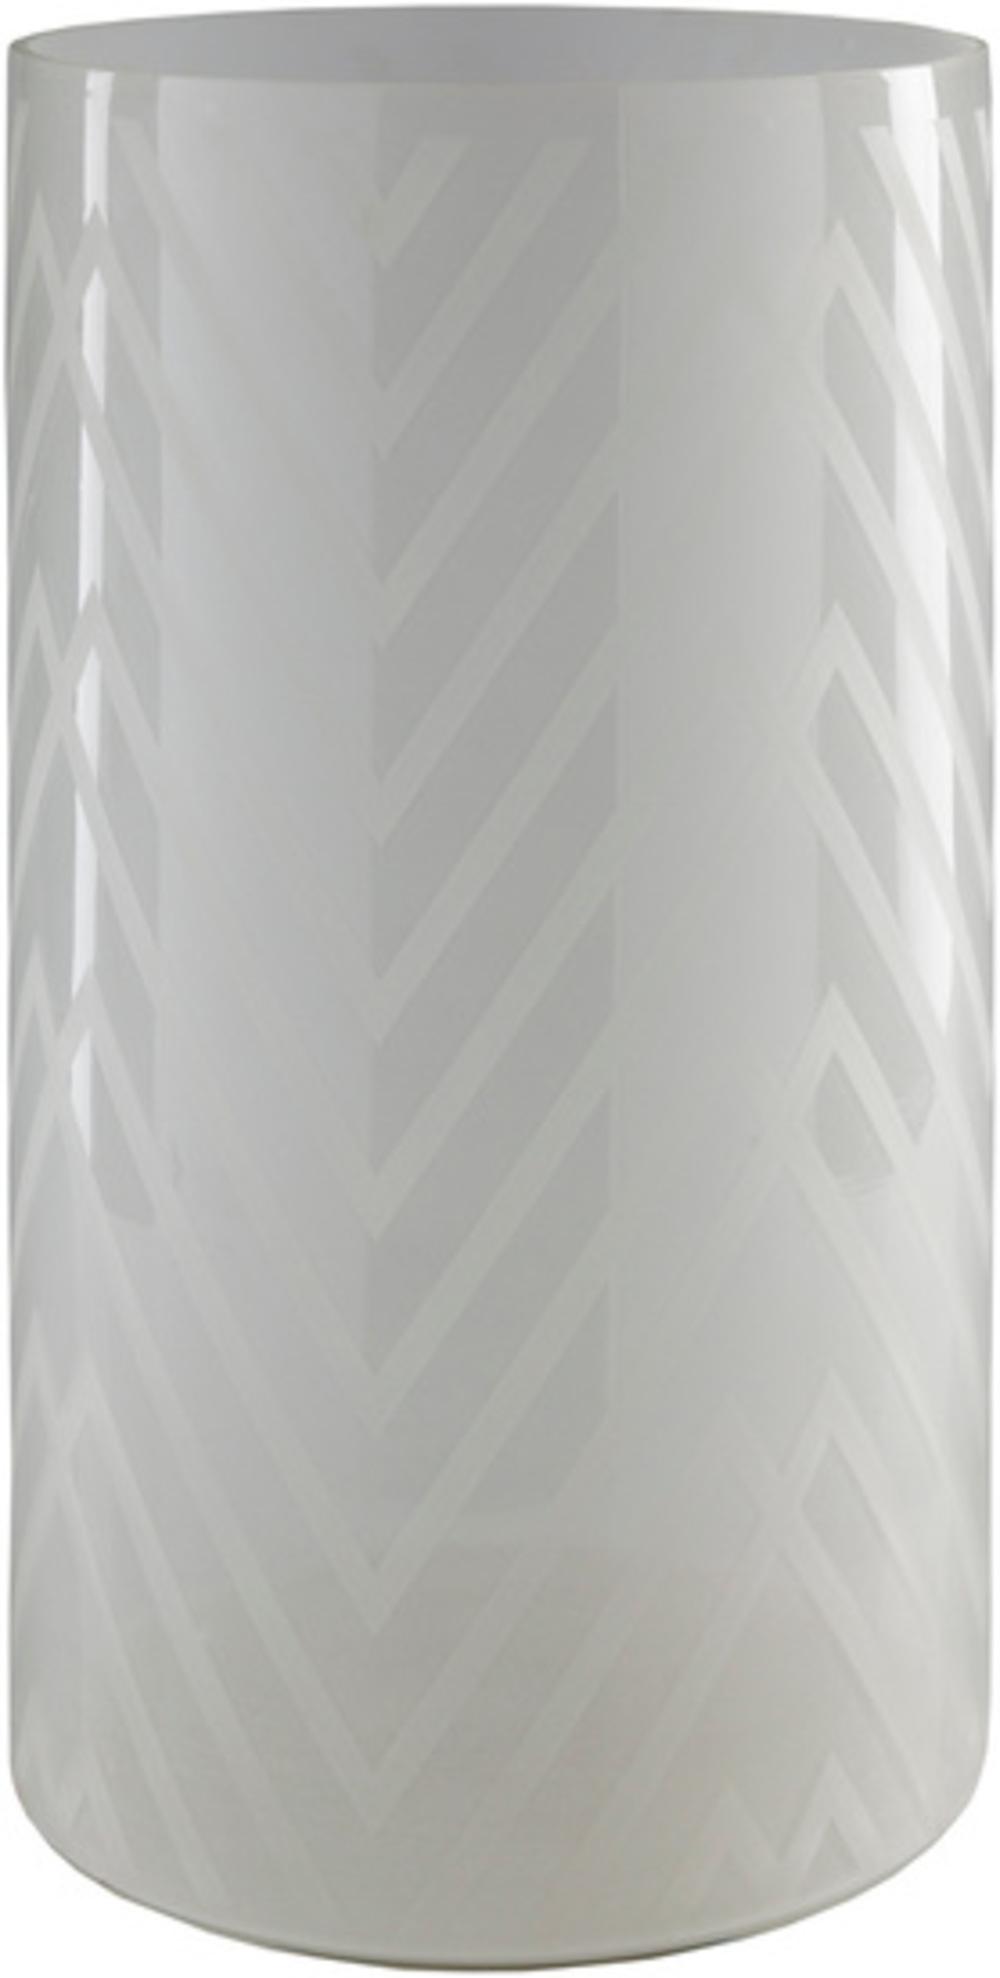 Surya - Trulli Vase